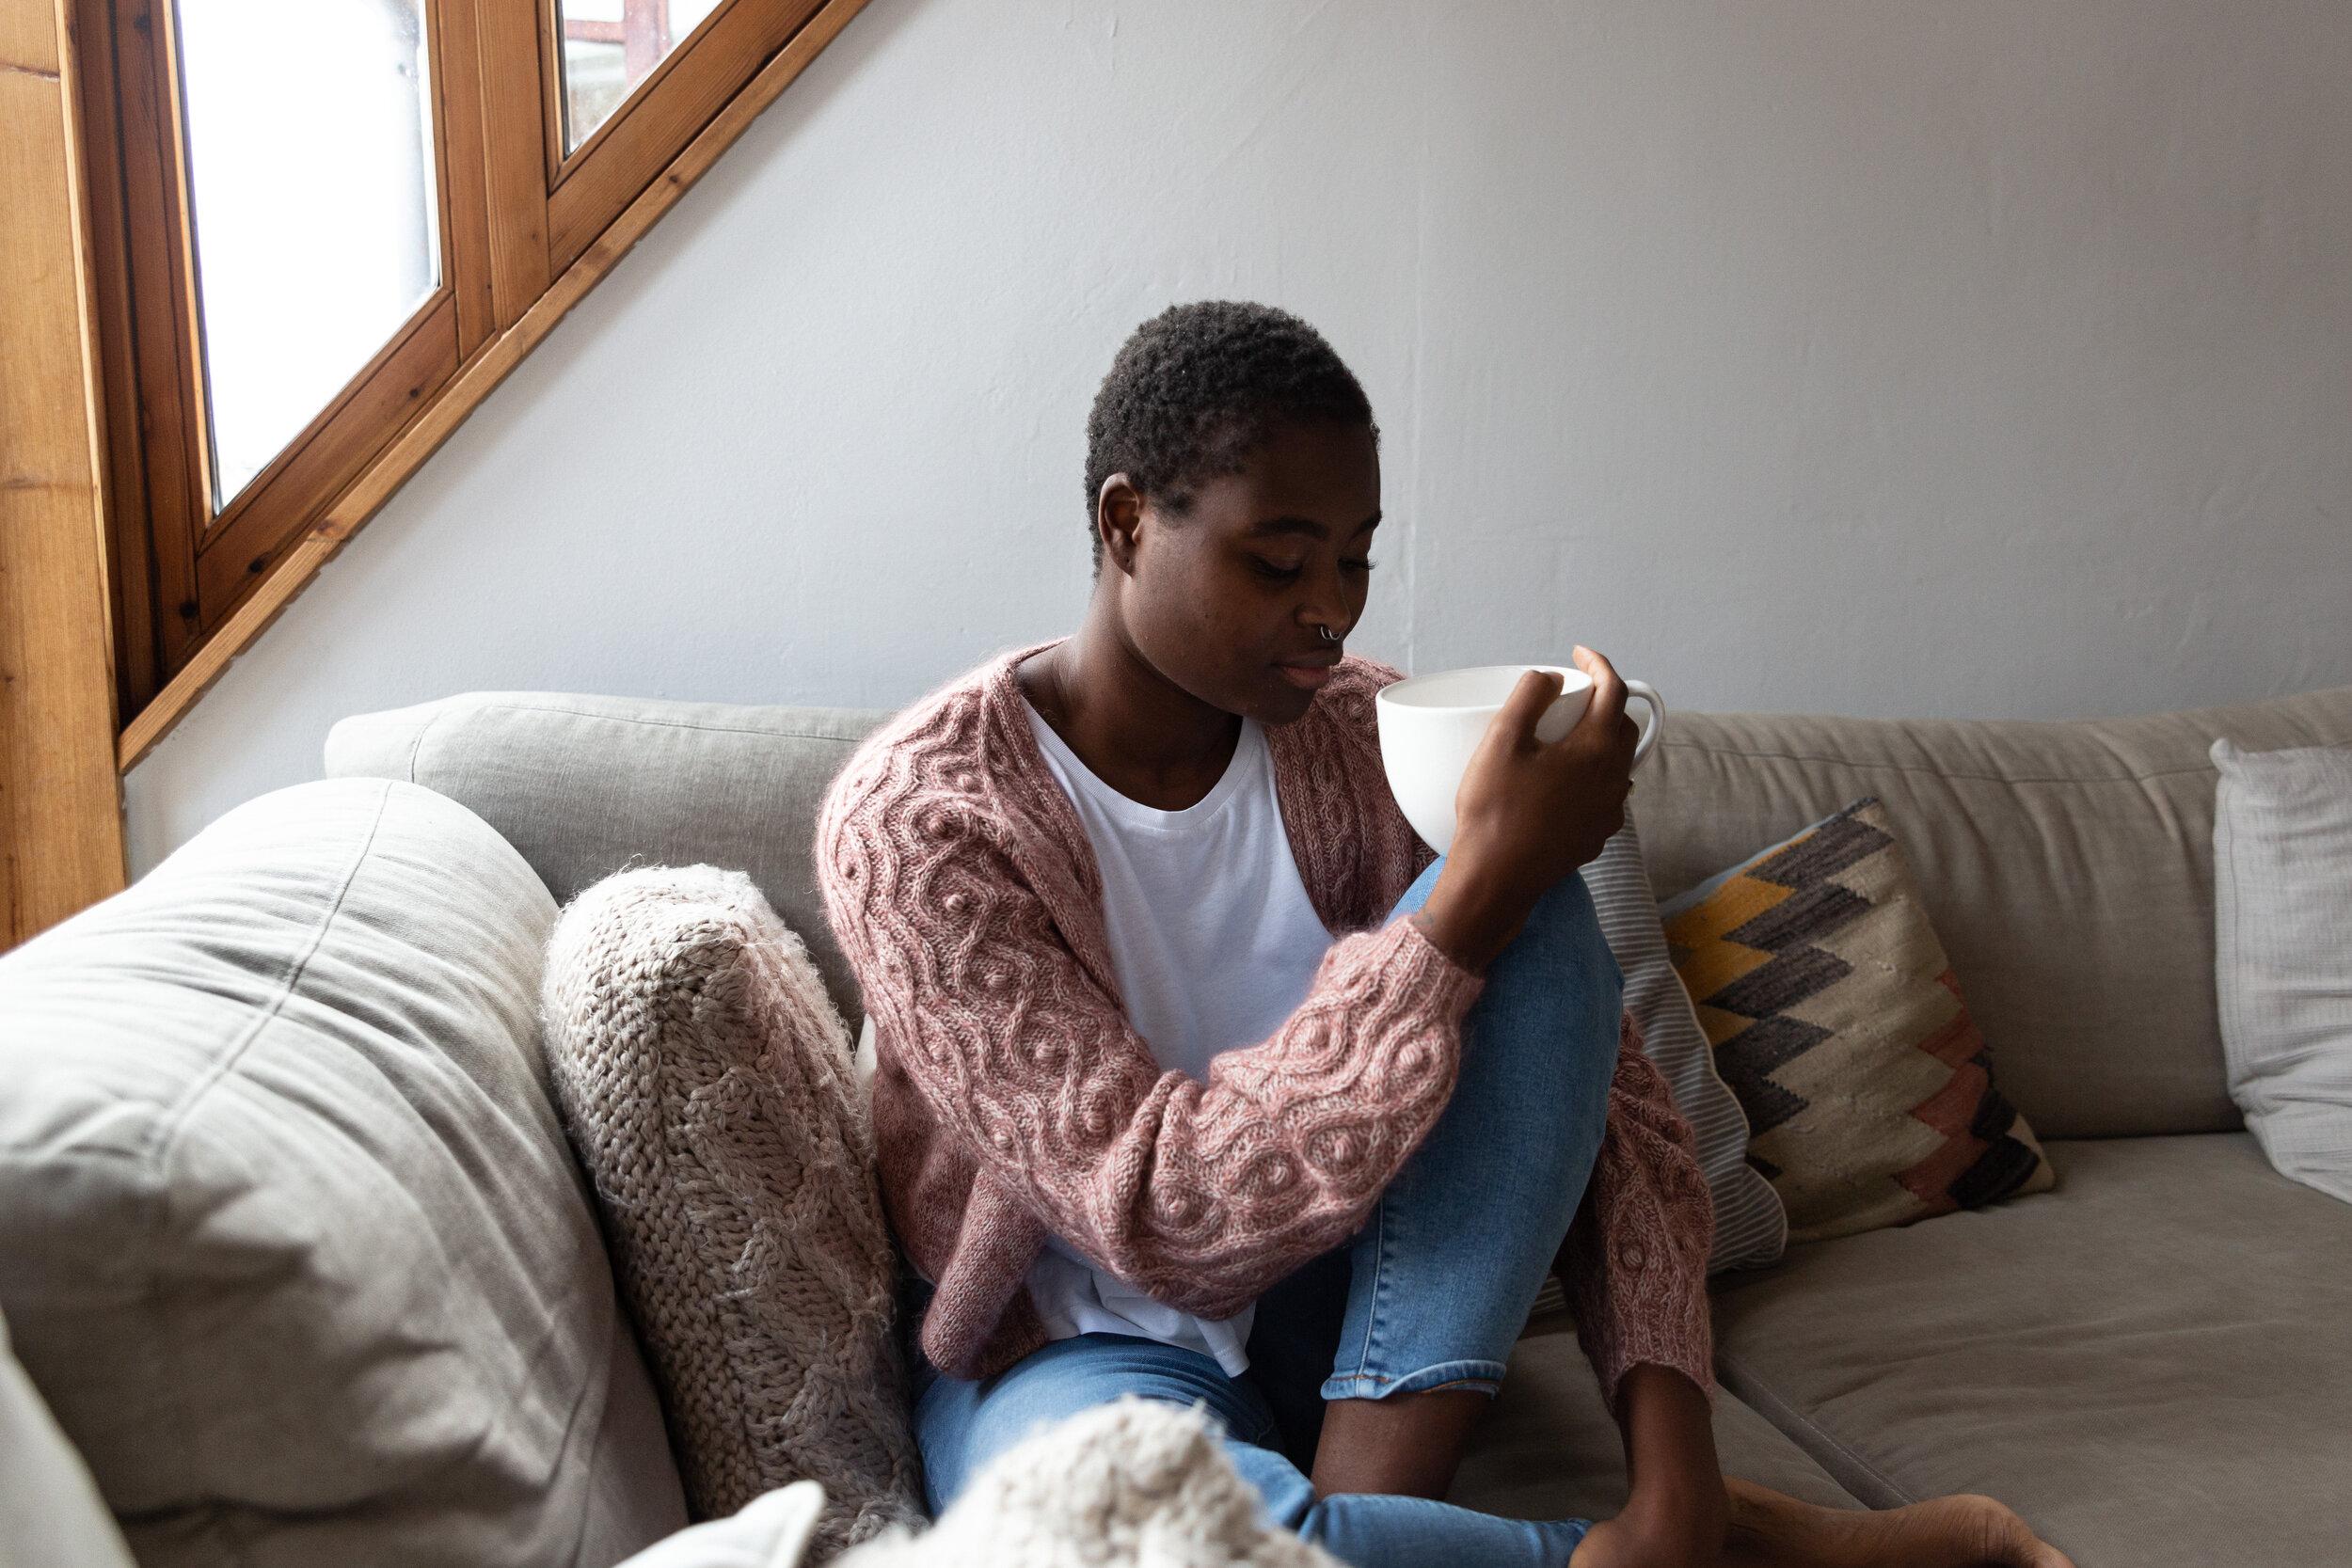 Bindweed Cardigan (Ksenia Naidyon, Issue 5), sample knit in Knitting for Olive Merino (Powder) & Soft Silk Mohair (Plum Rose)